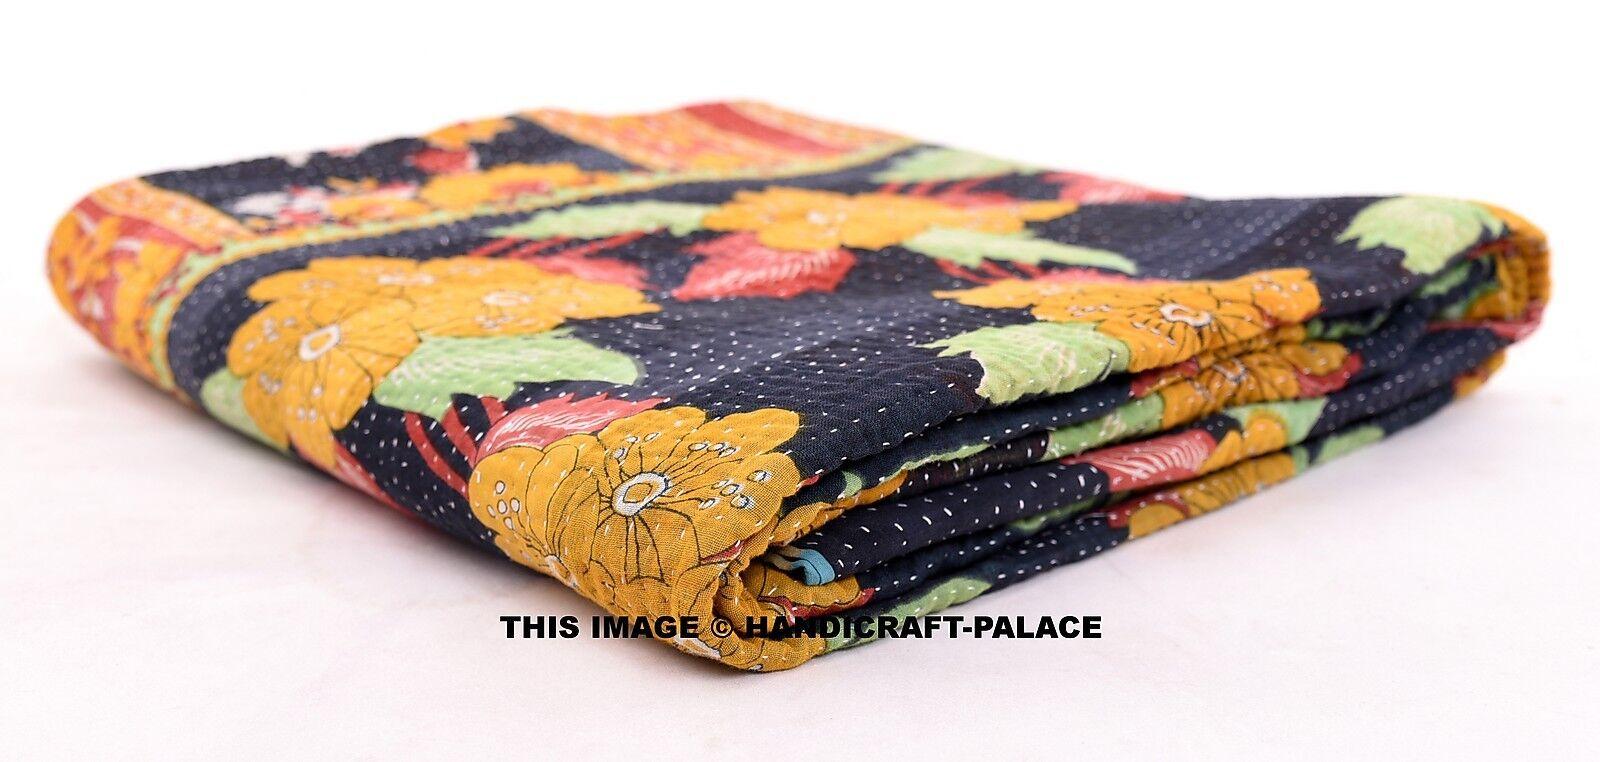 Vintage Embroiderot Twin Kantha Kantha Kantha Quilt Patchwork Cotton Blanket Bedspread Decor cc60fa